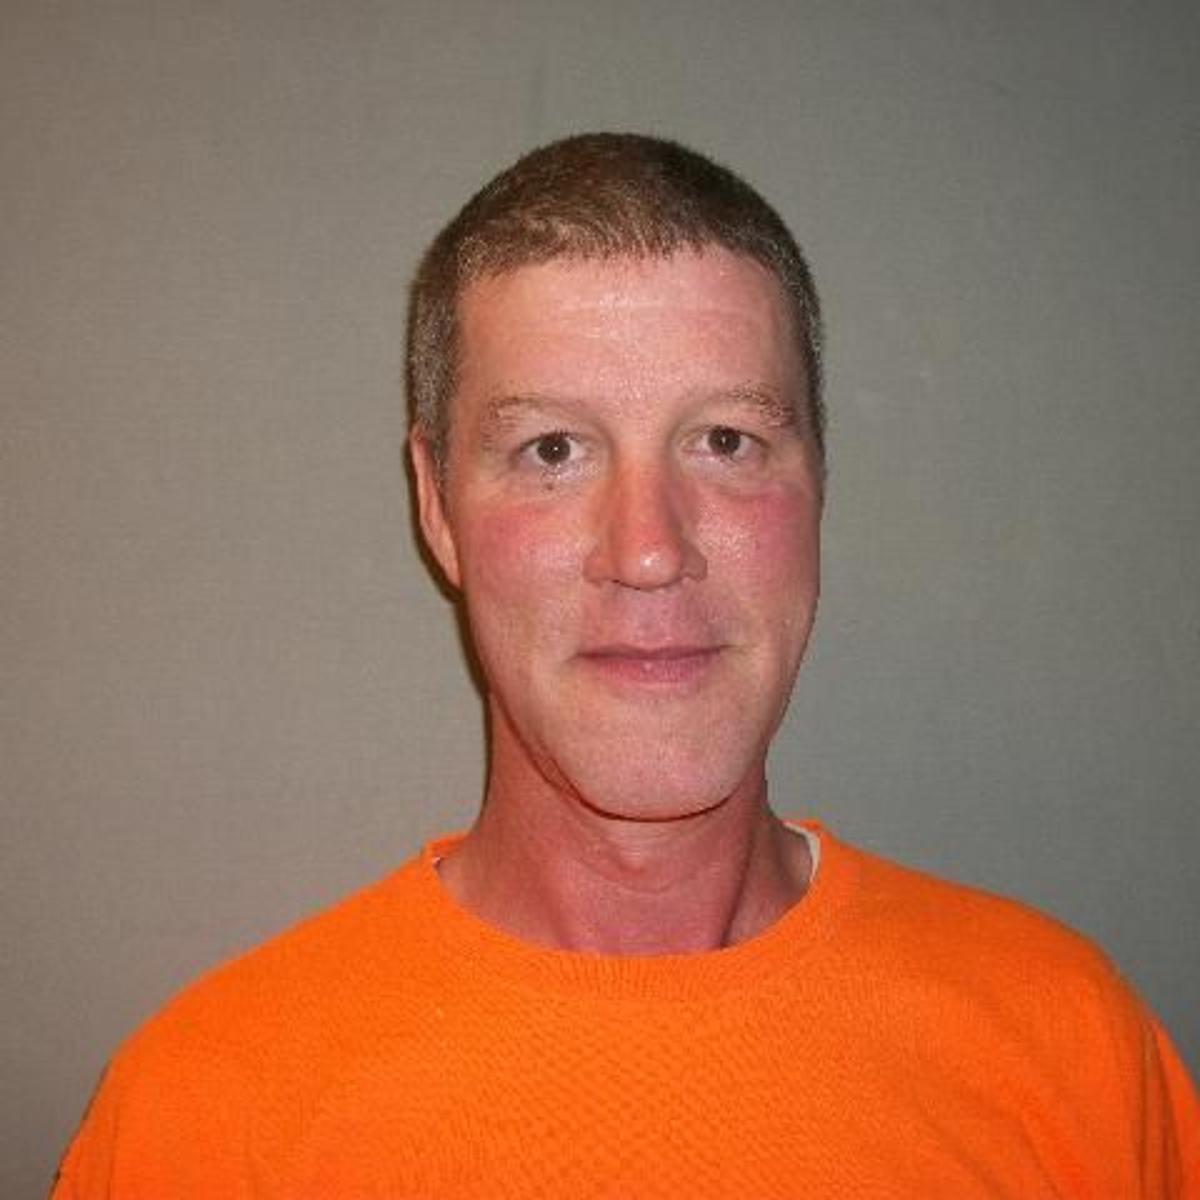 Craigslist Missoula Mt >> Man In Missoula County Jail For Seeking Sex With Teen